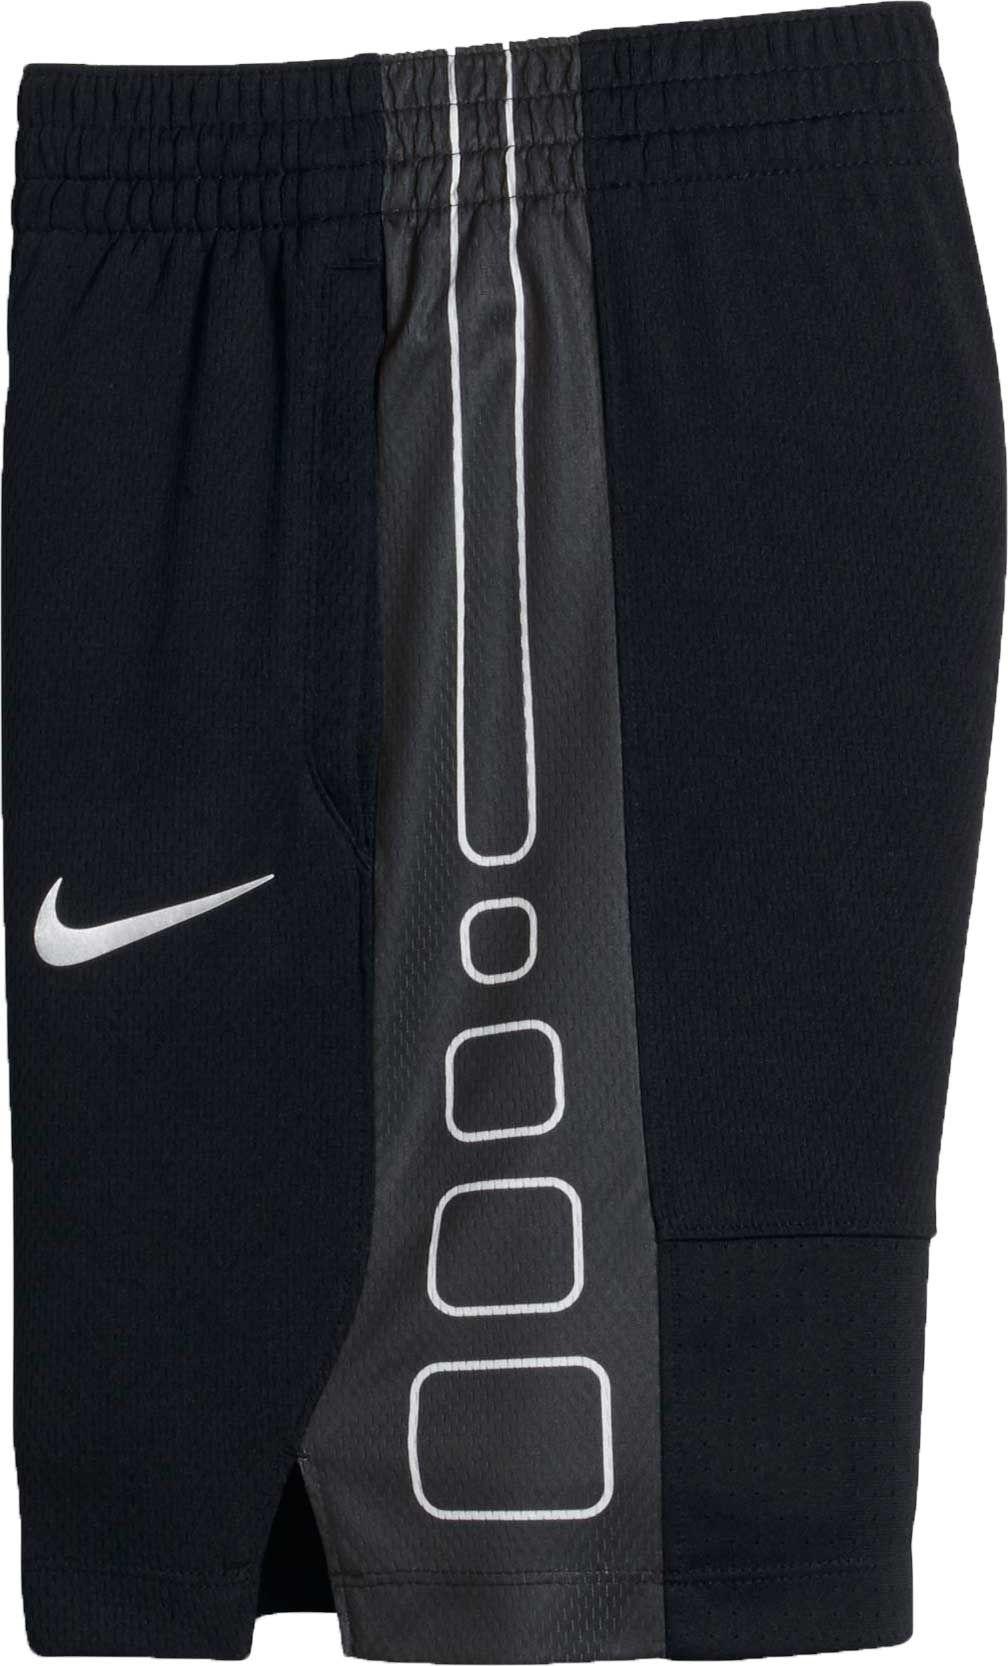 dfa2bfc00cb9 Mens Basketball Shorts Nike Elite Stripe Dark Grey Xqh40952 Vast